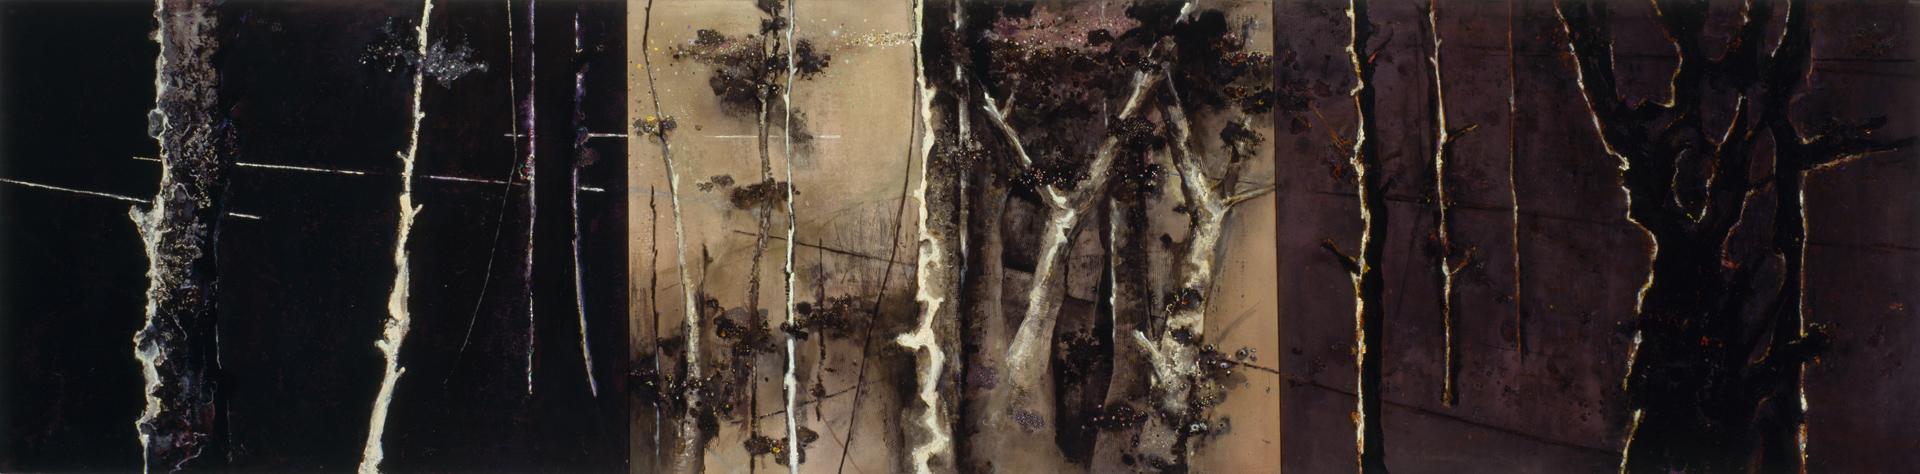 Lyminge Forest III 1983-1999,168 x 685 cm